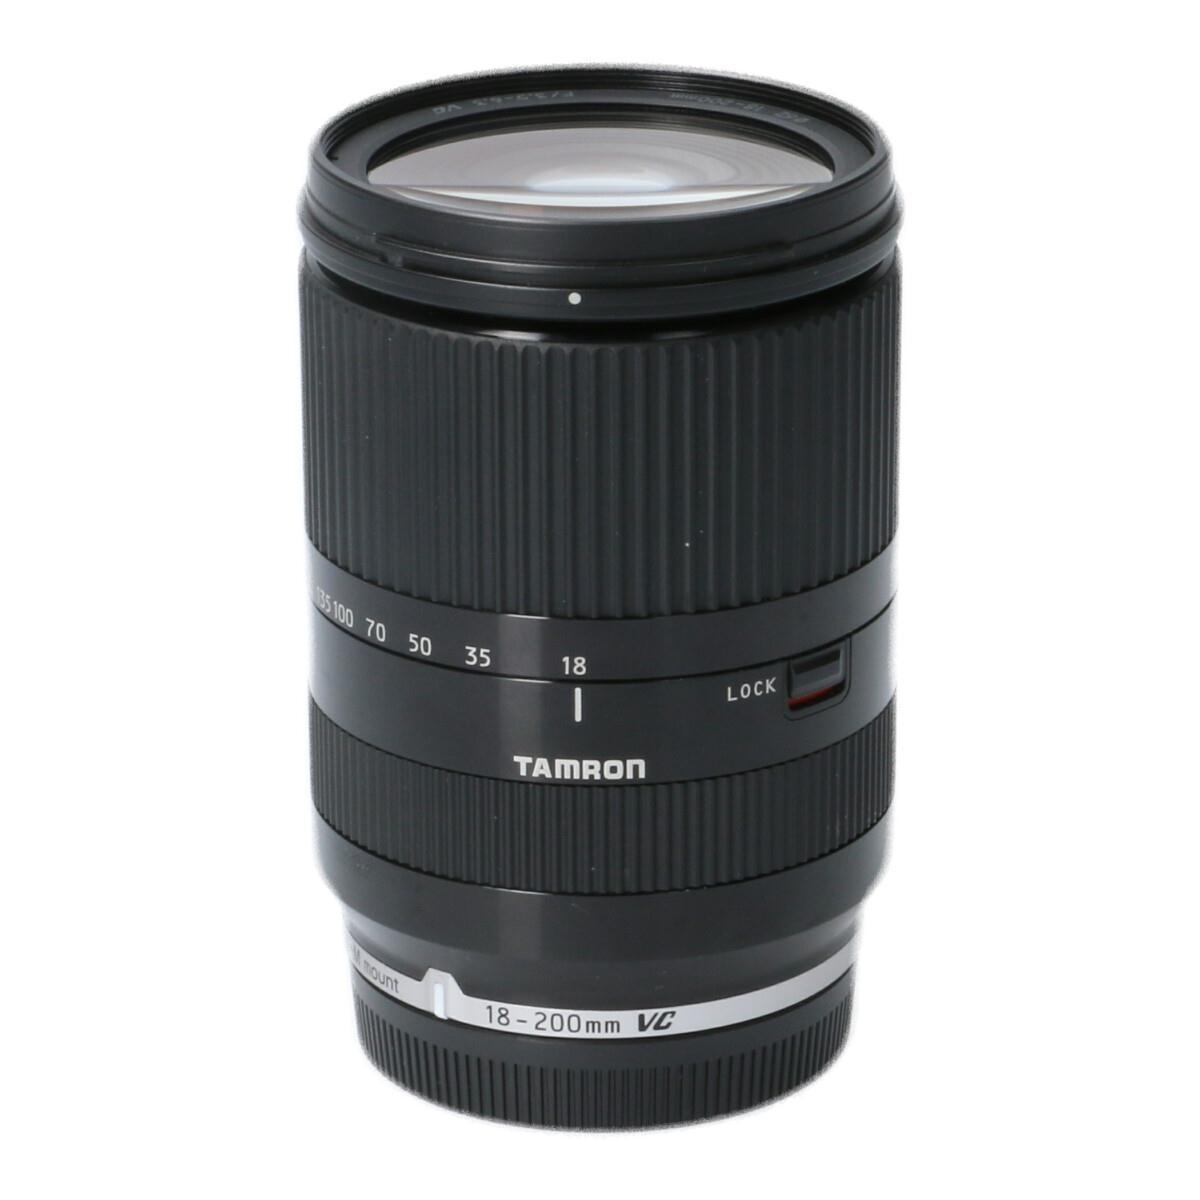 TAMRON EFM18-200mm F3.5-6.3 B011EM【中古】